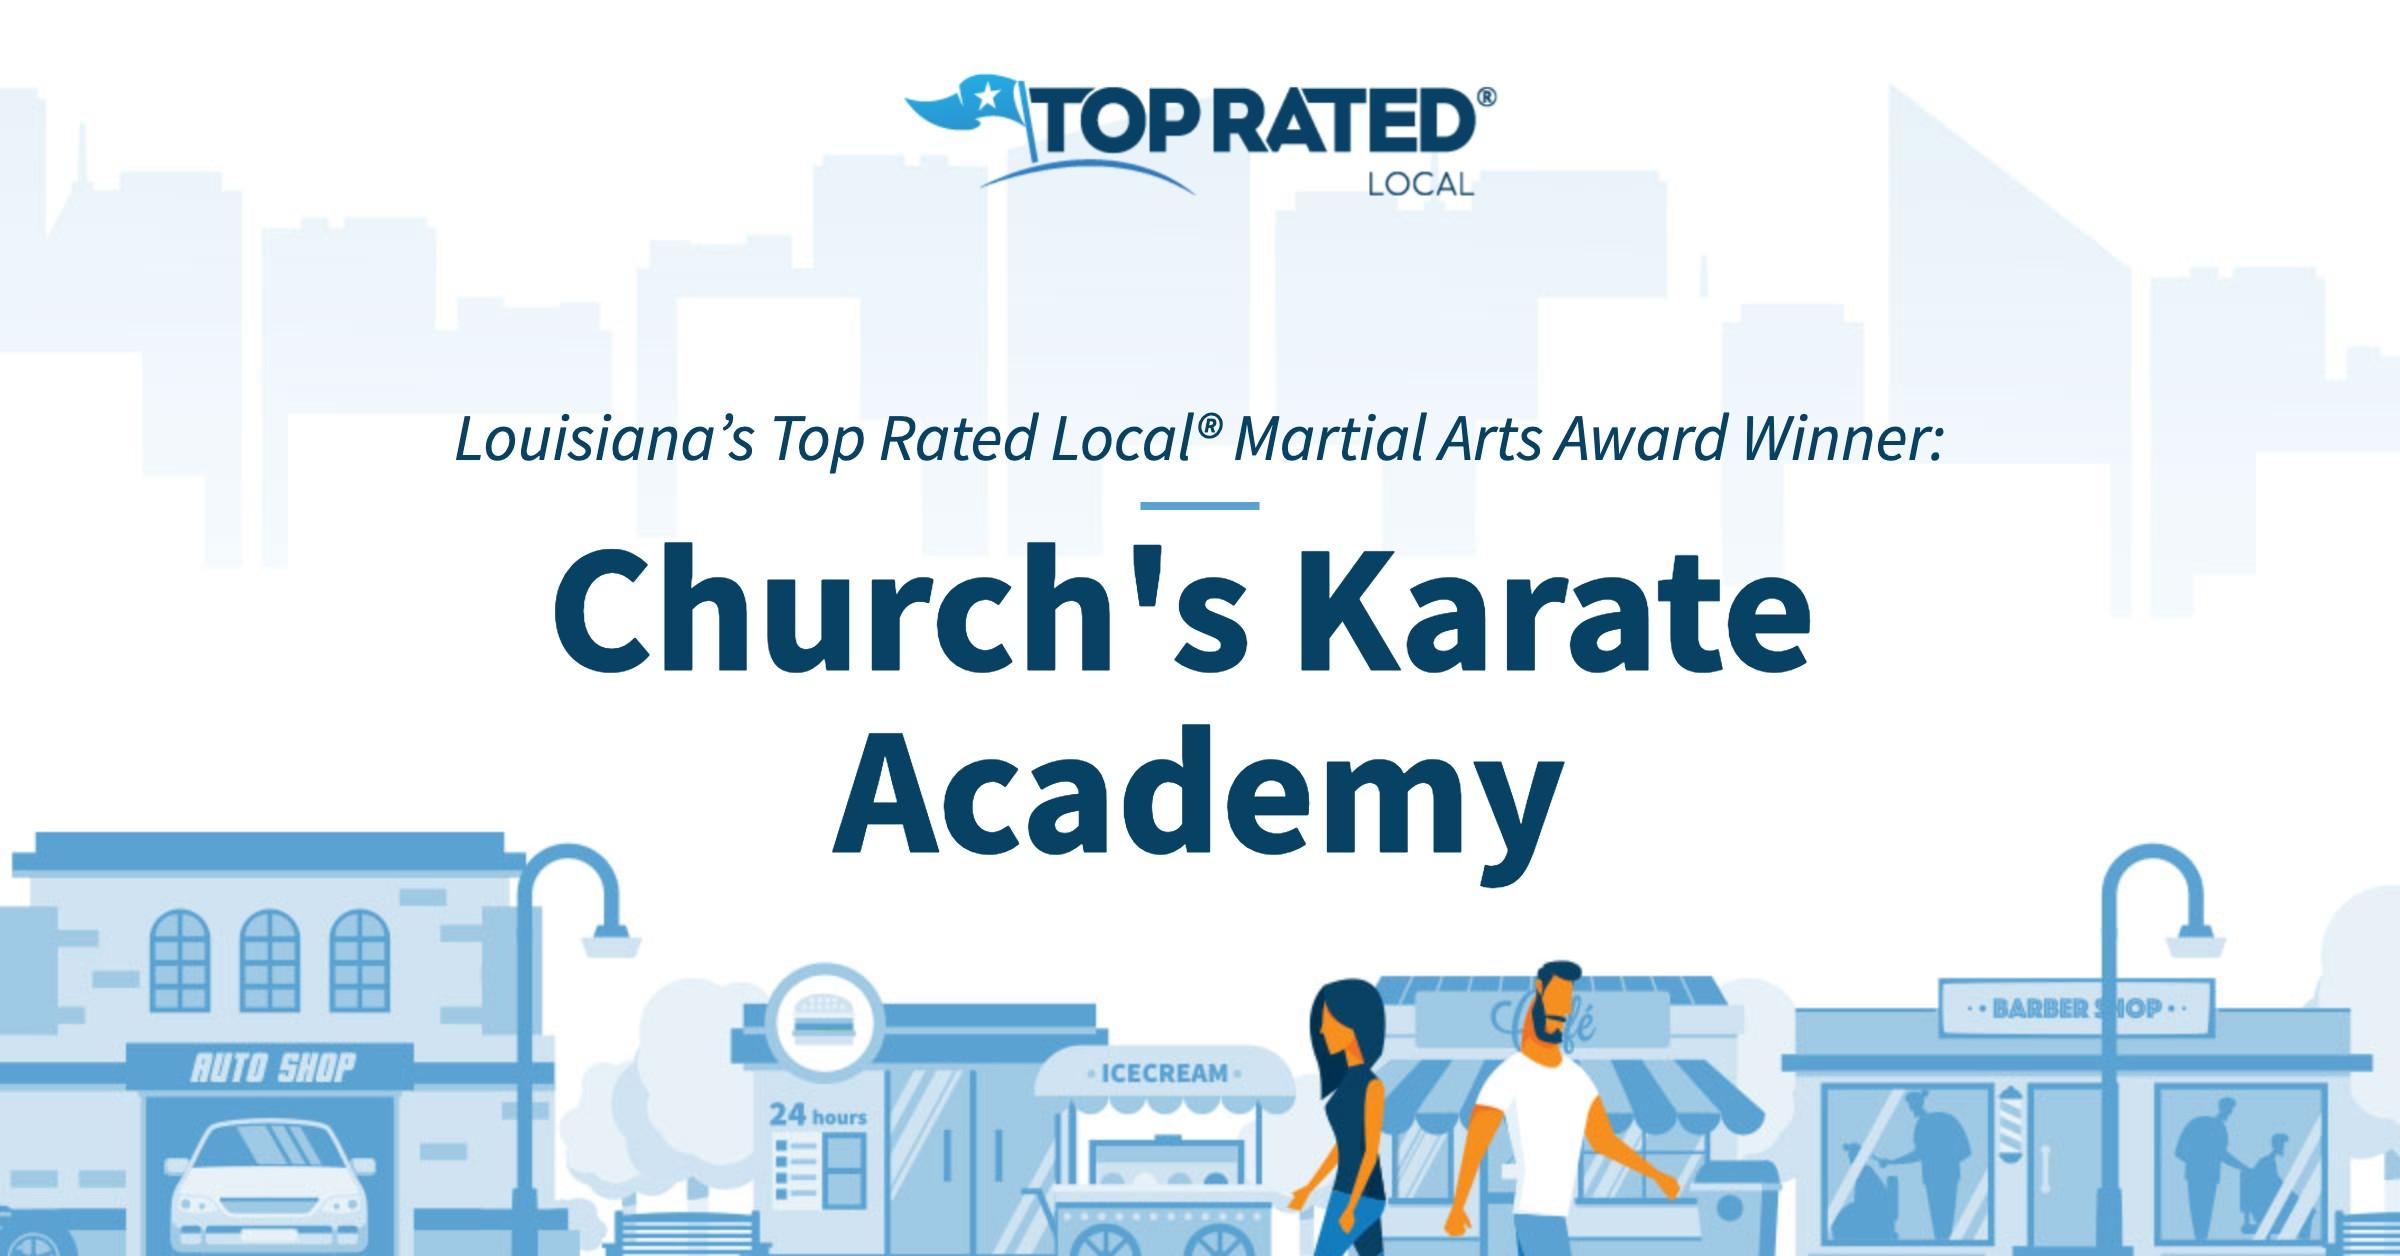 Louisiana's Top Rated Local® Martial Arts Award Winner: Church's Karate Academy